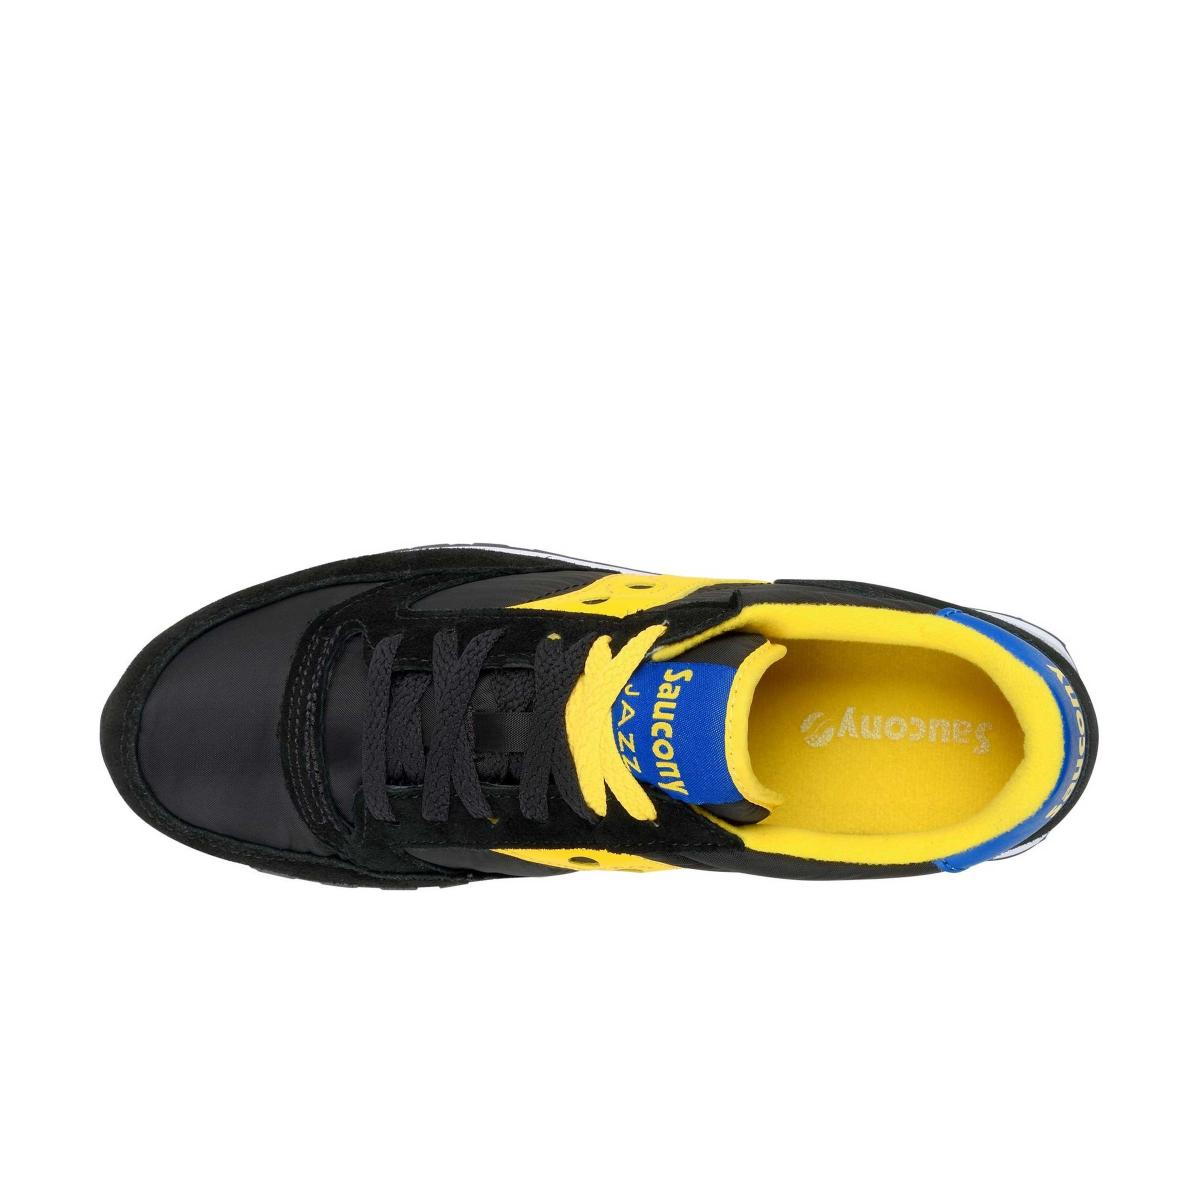 Scarpe Sneakers Saucony Jazz Original da uomo rif. S2044-510